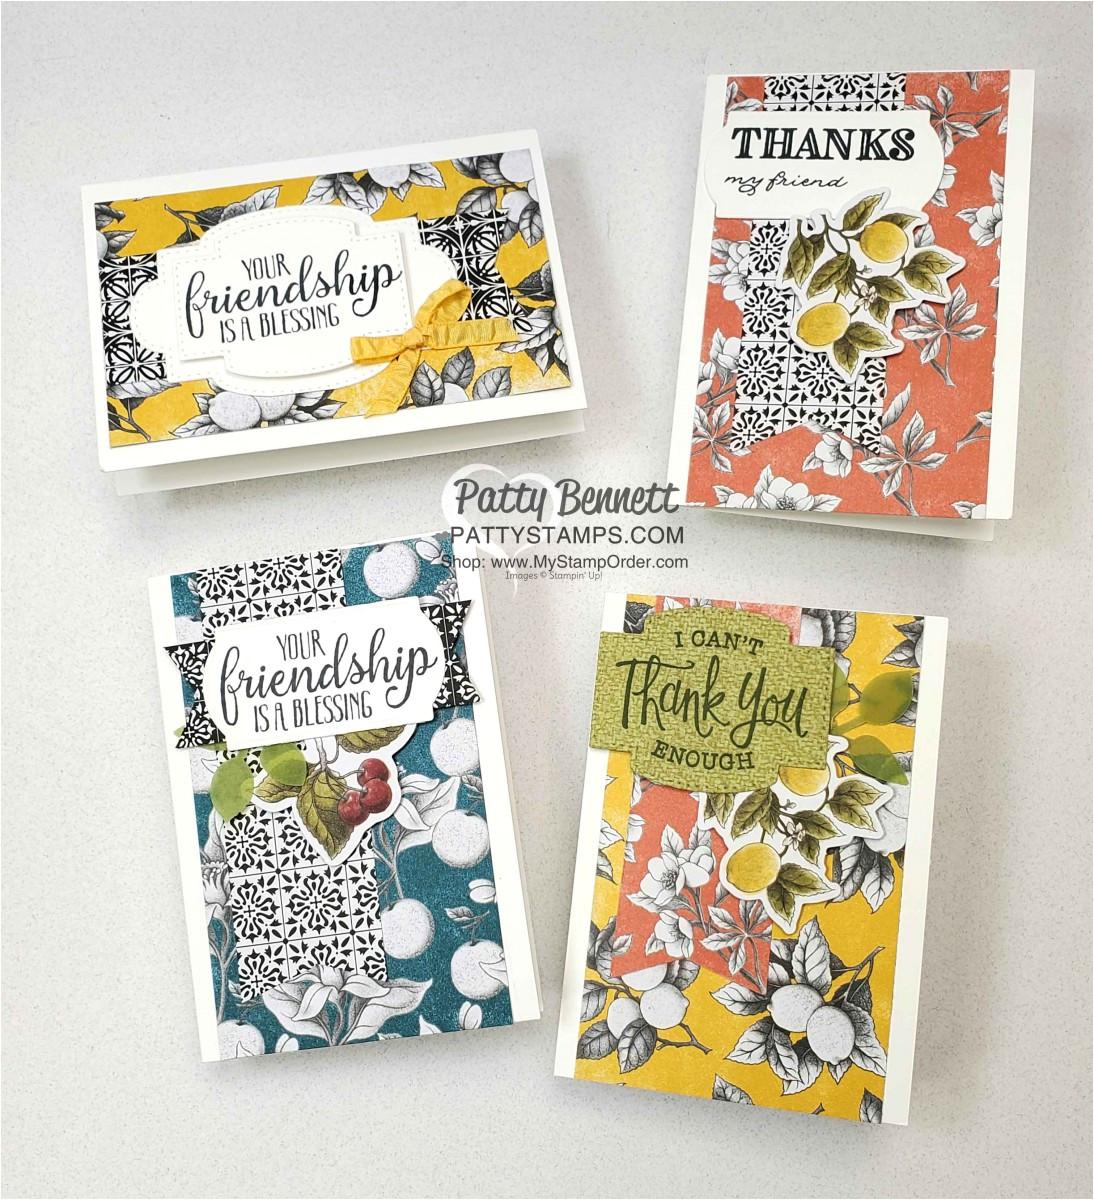 botanical prints card kit banner punch stampin up pattystamps so sentimental jpg